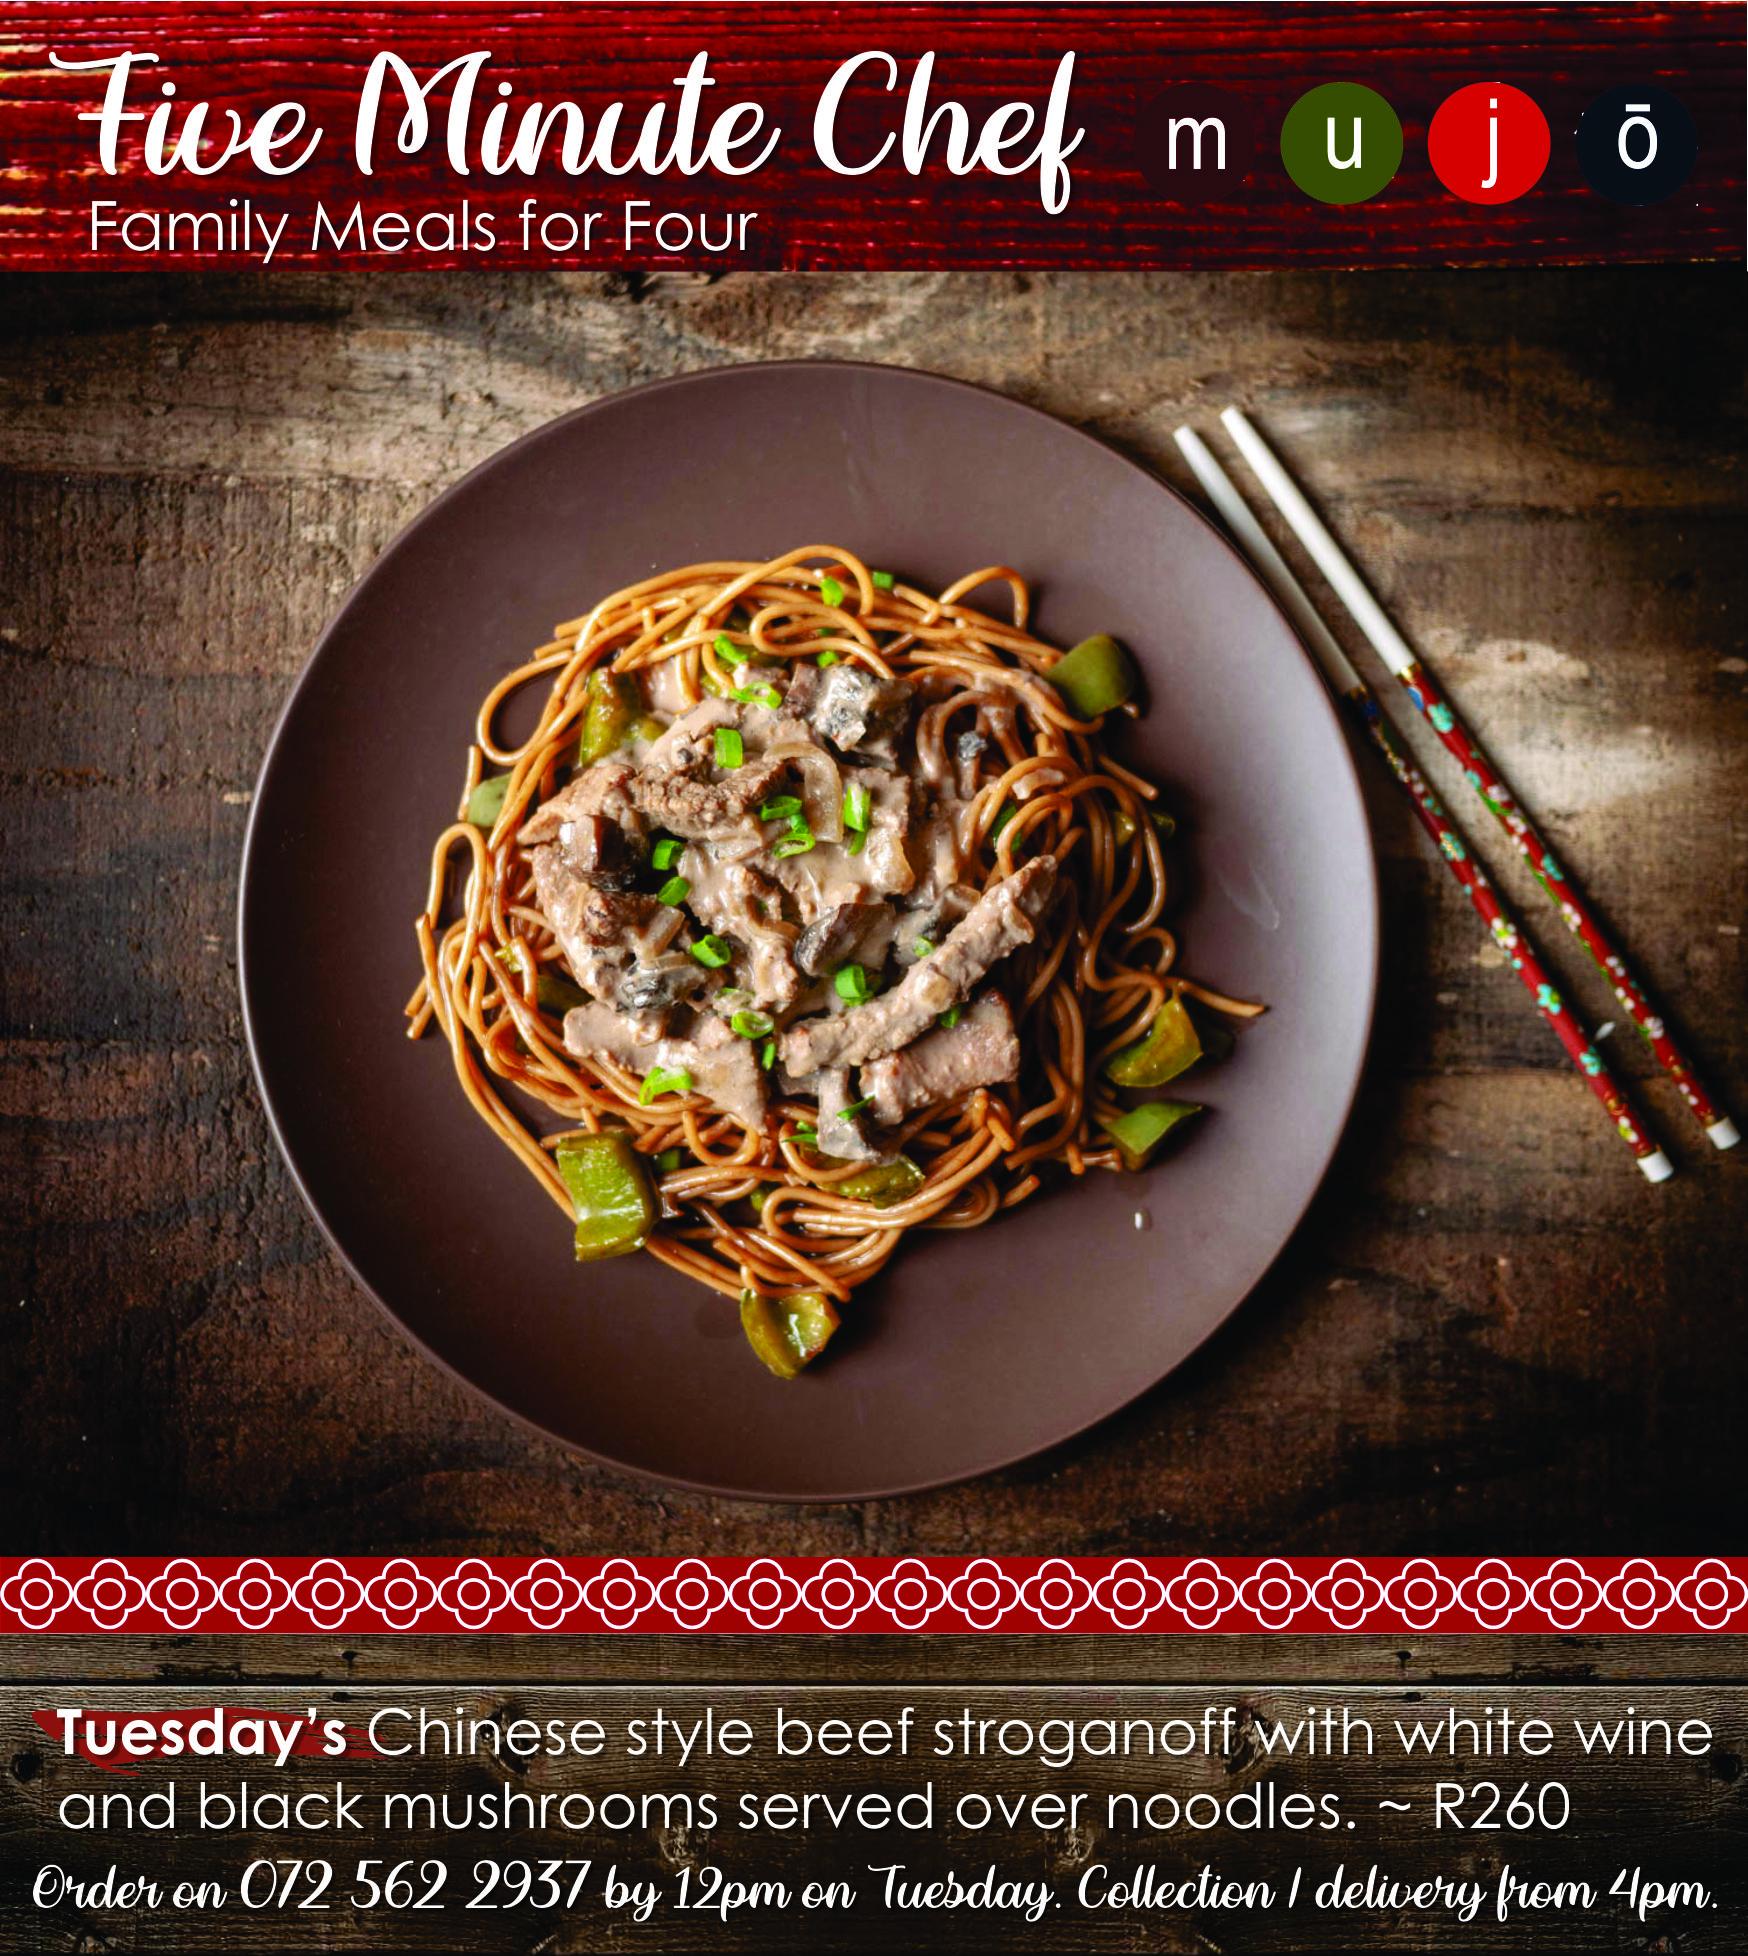 Five Minute Chef Chinese stroganoff